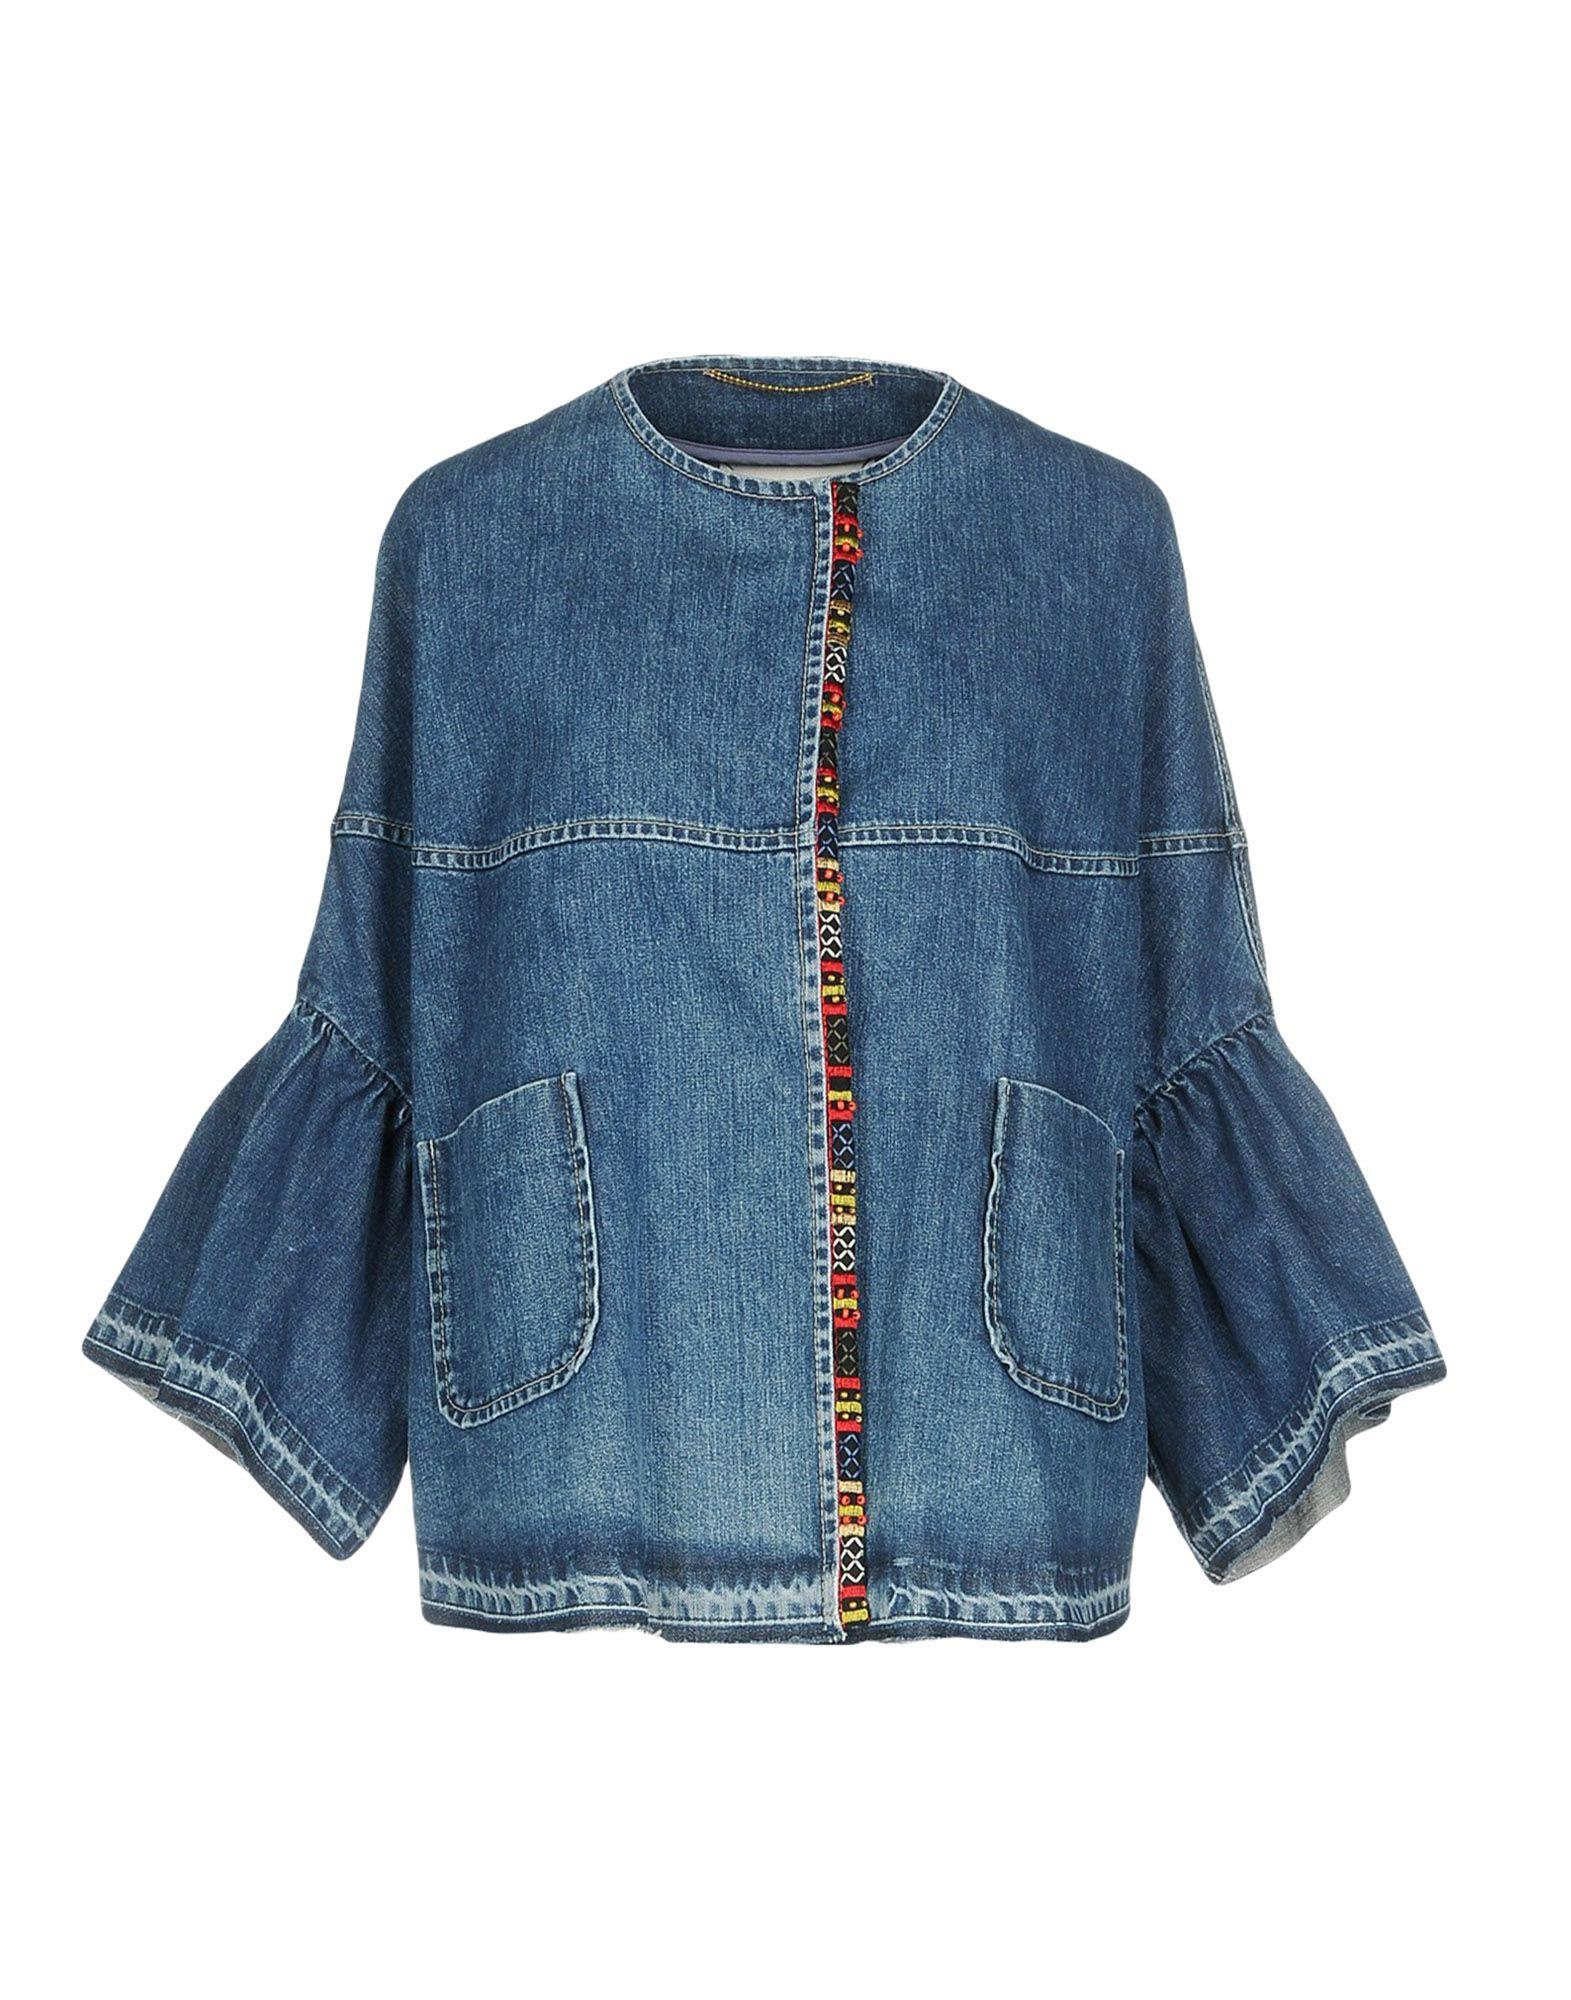 BAZAR DELUXE Джинсовая верхняя одежда folk джинсовая верхняя одежда